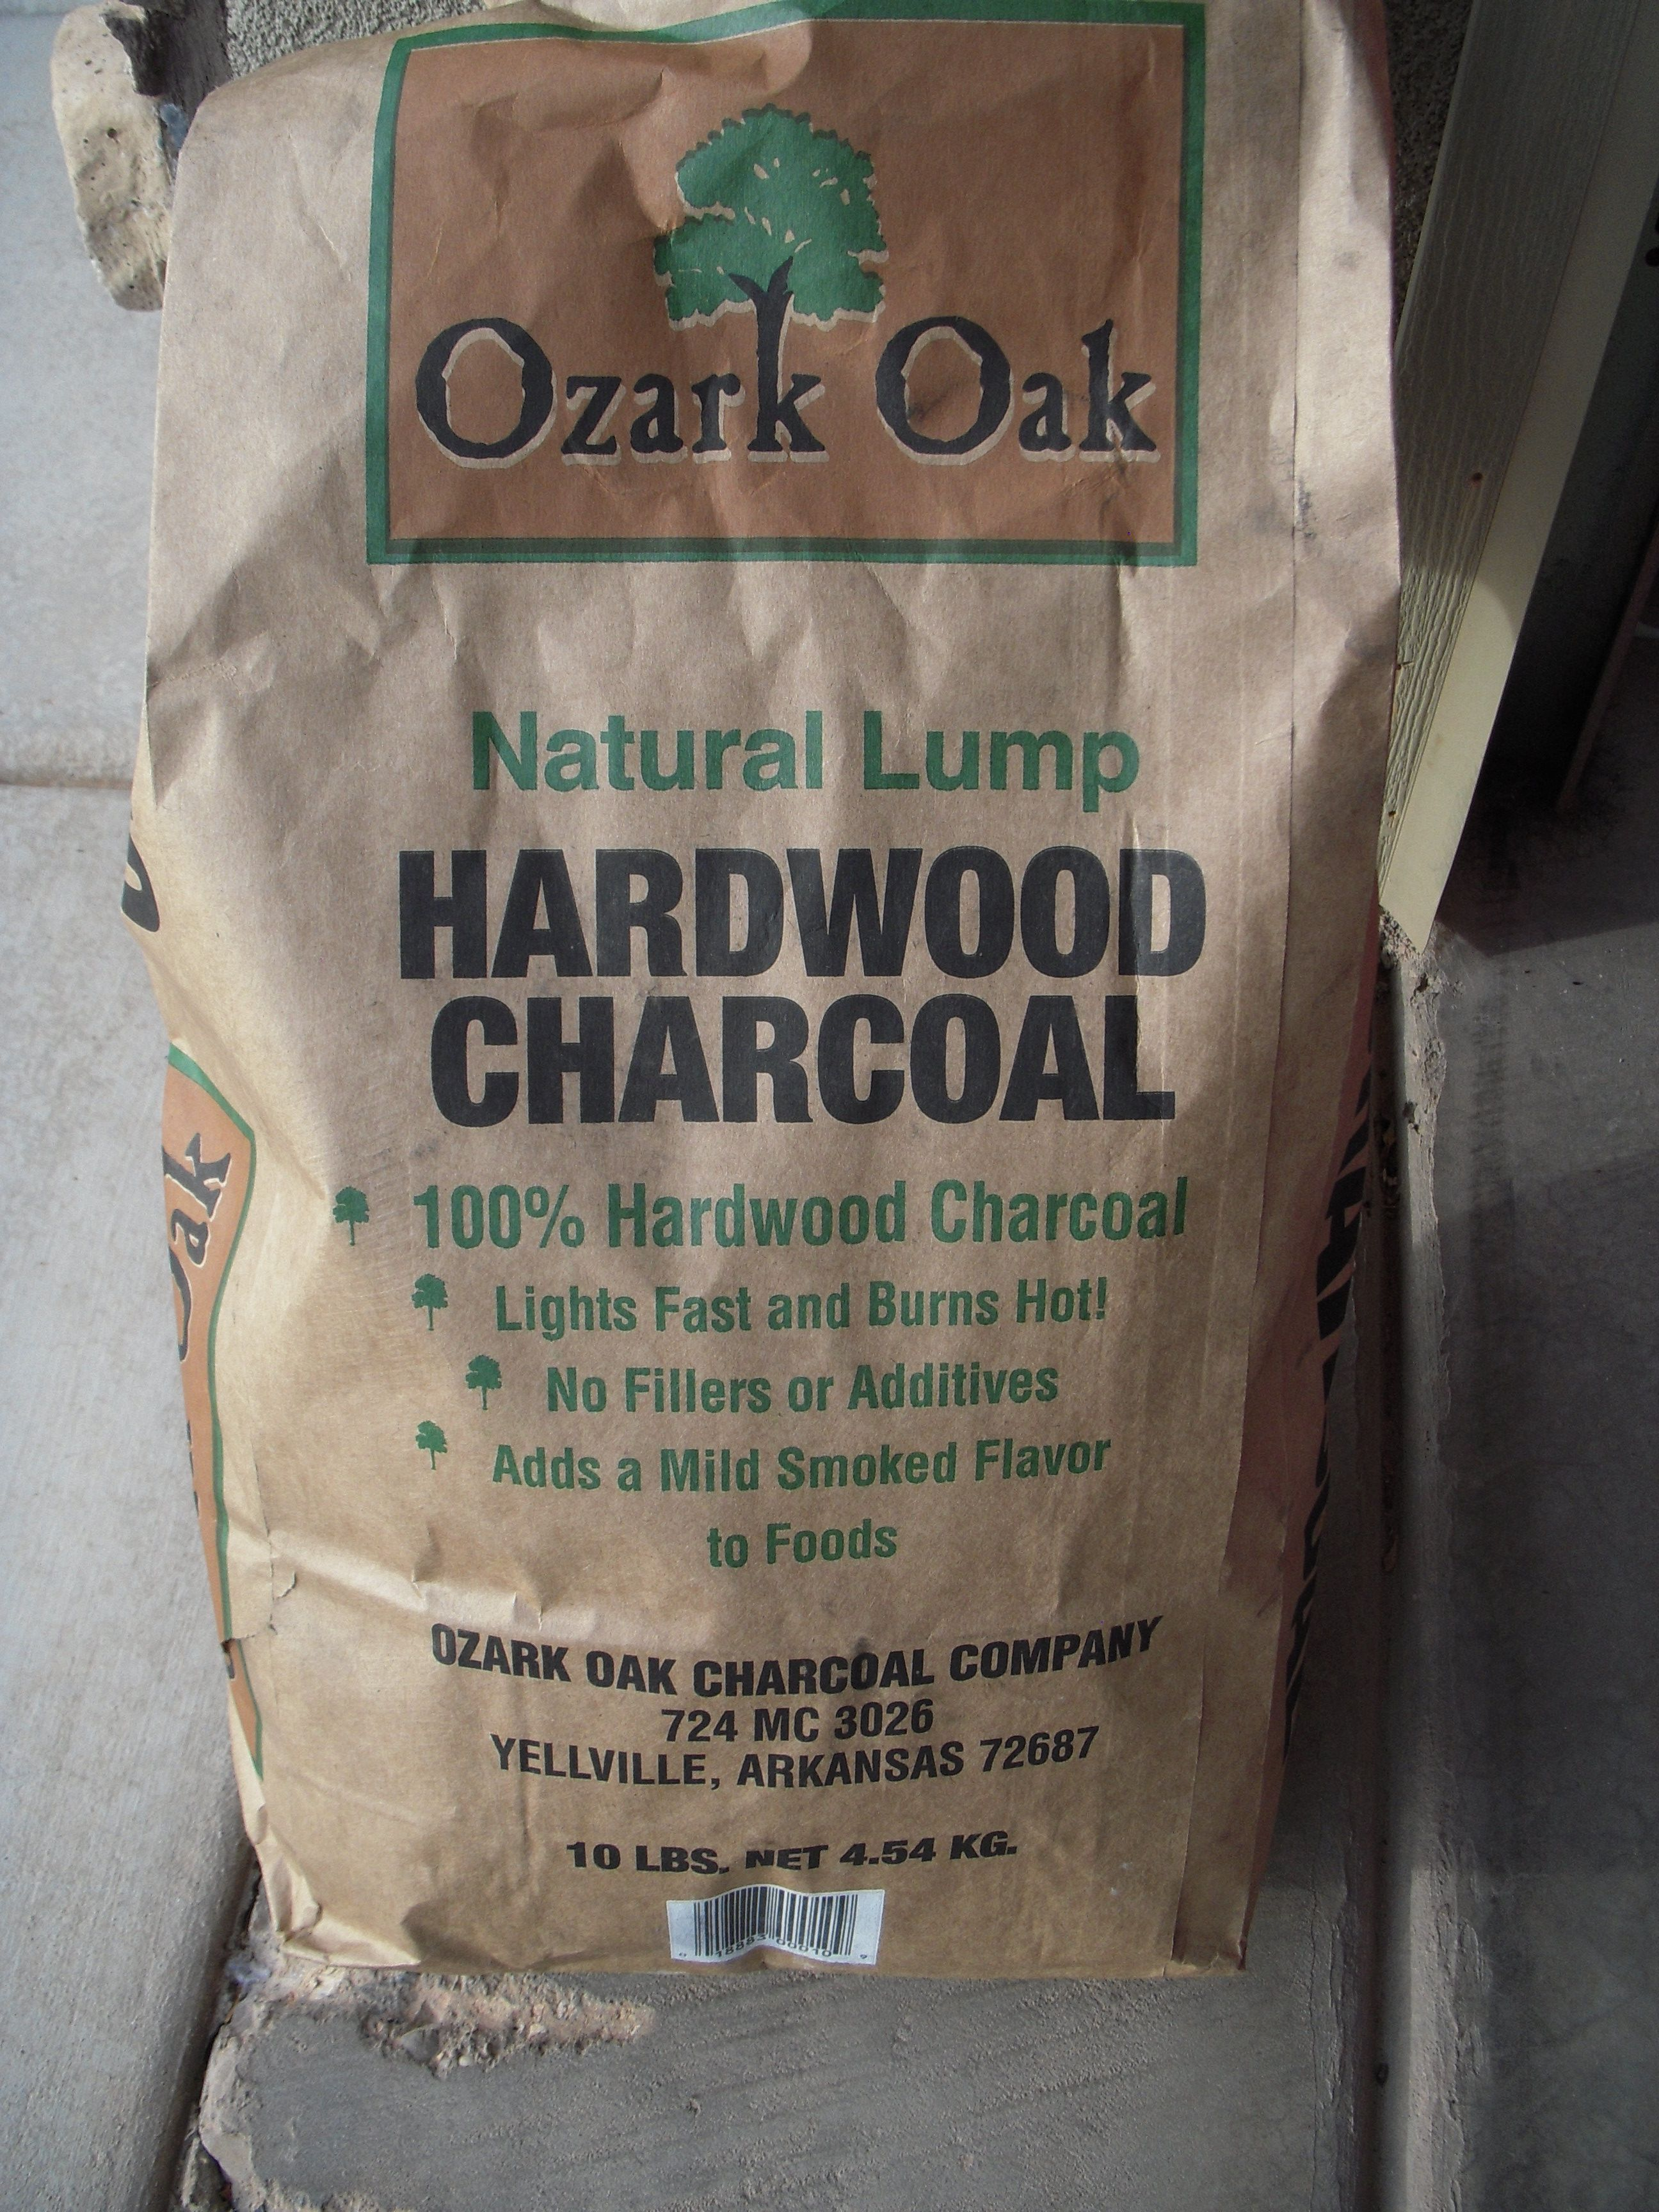 Ozark Oak Lump Charcoal and Volocano II Stoves